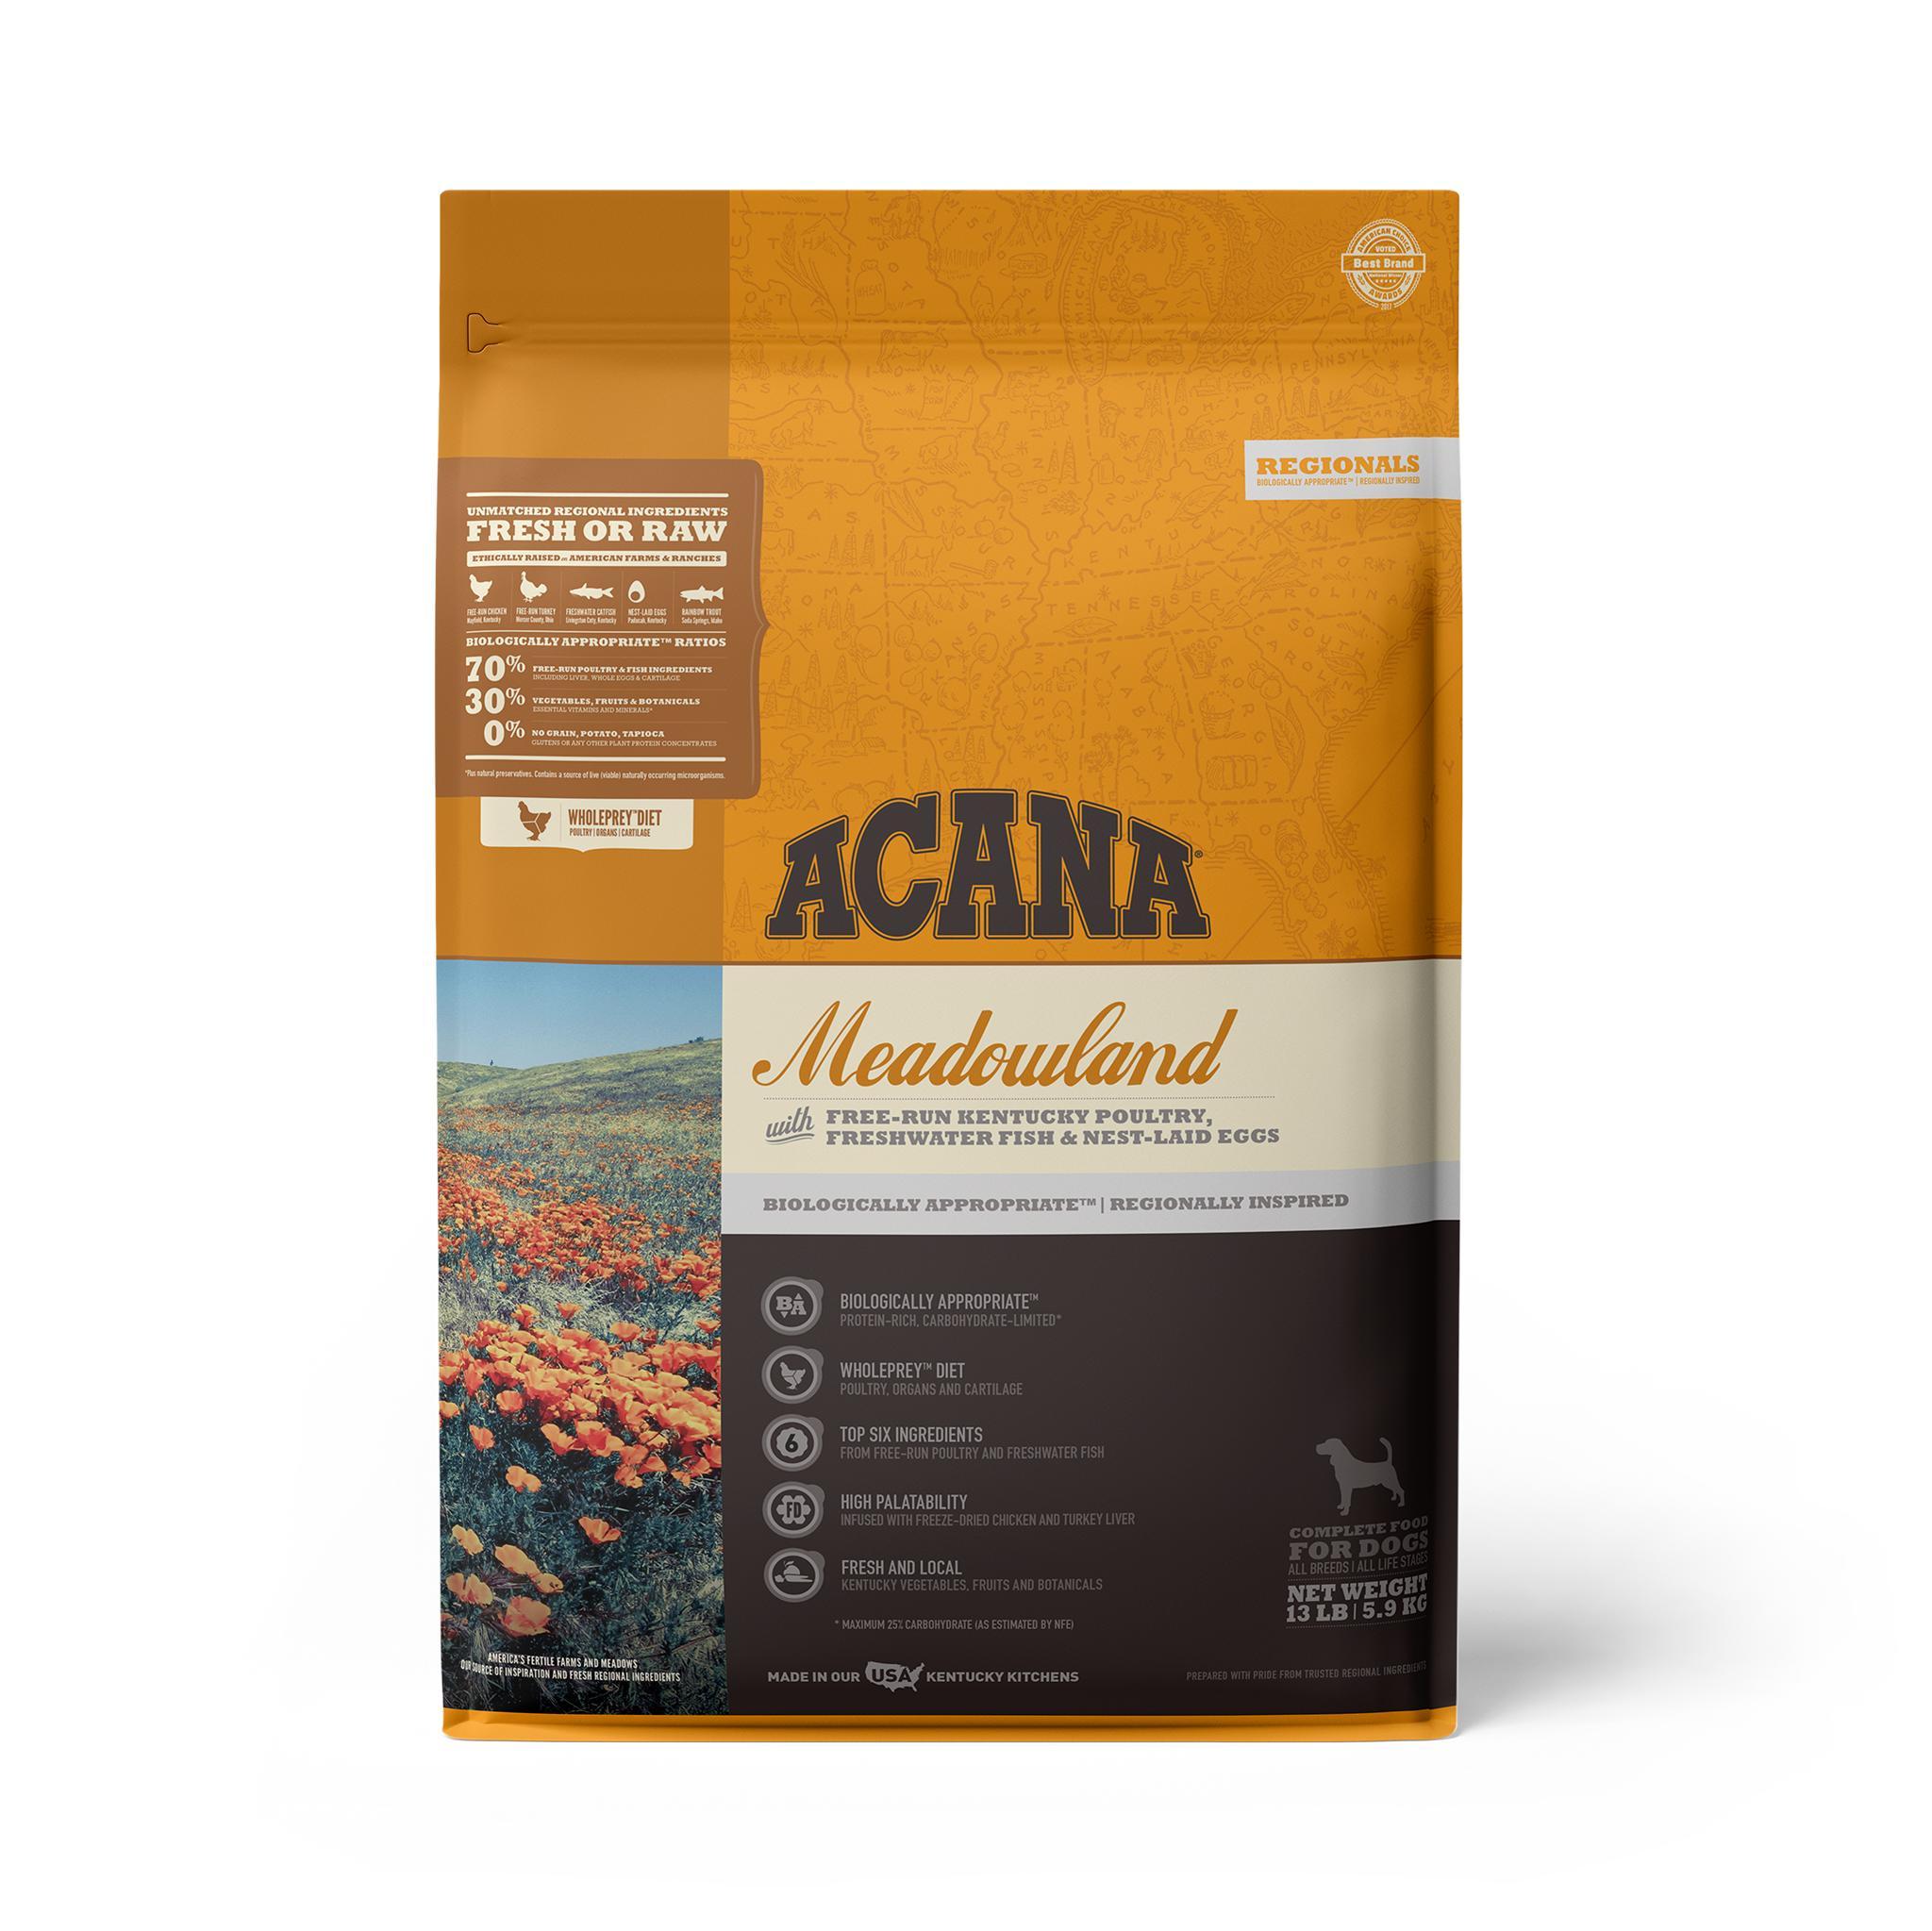 ACANA Regionals Meadowland Grain-Free Dry Dog Food, 13-lb